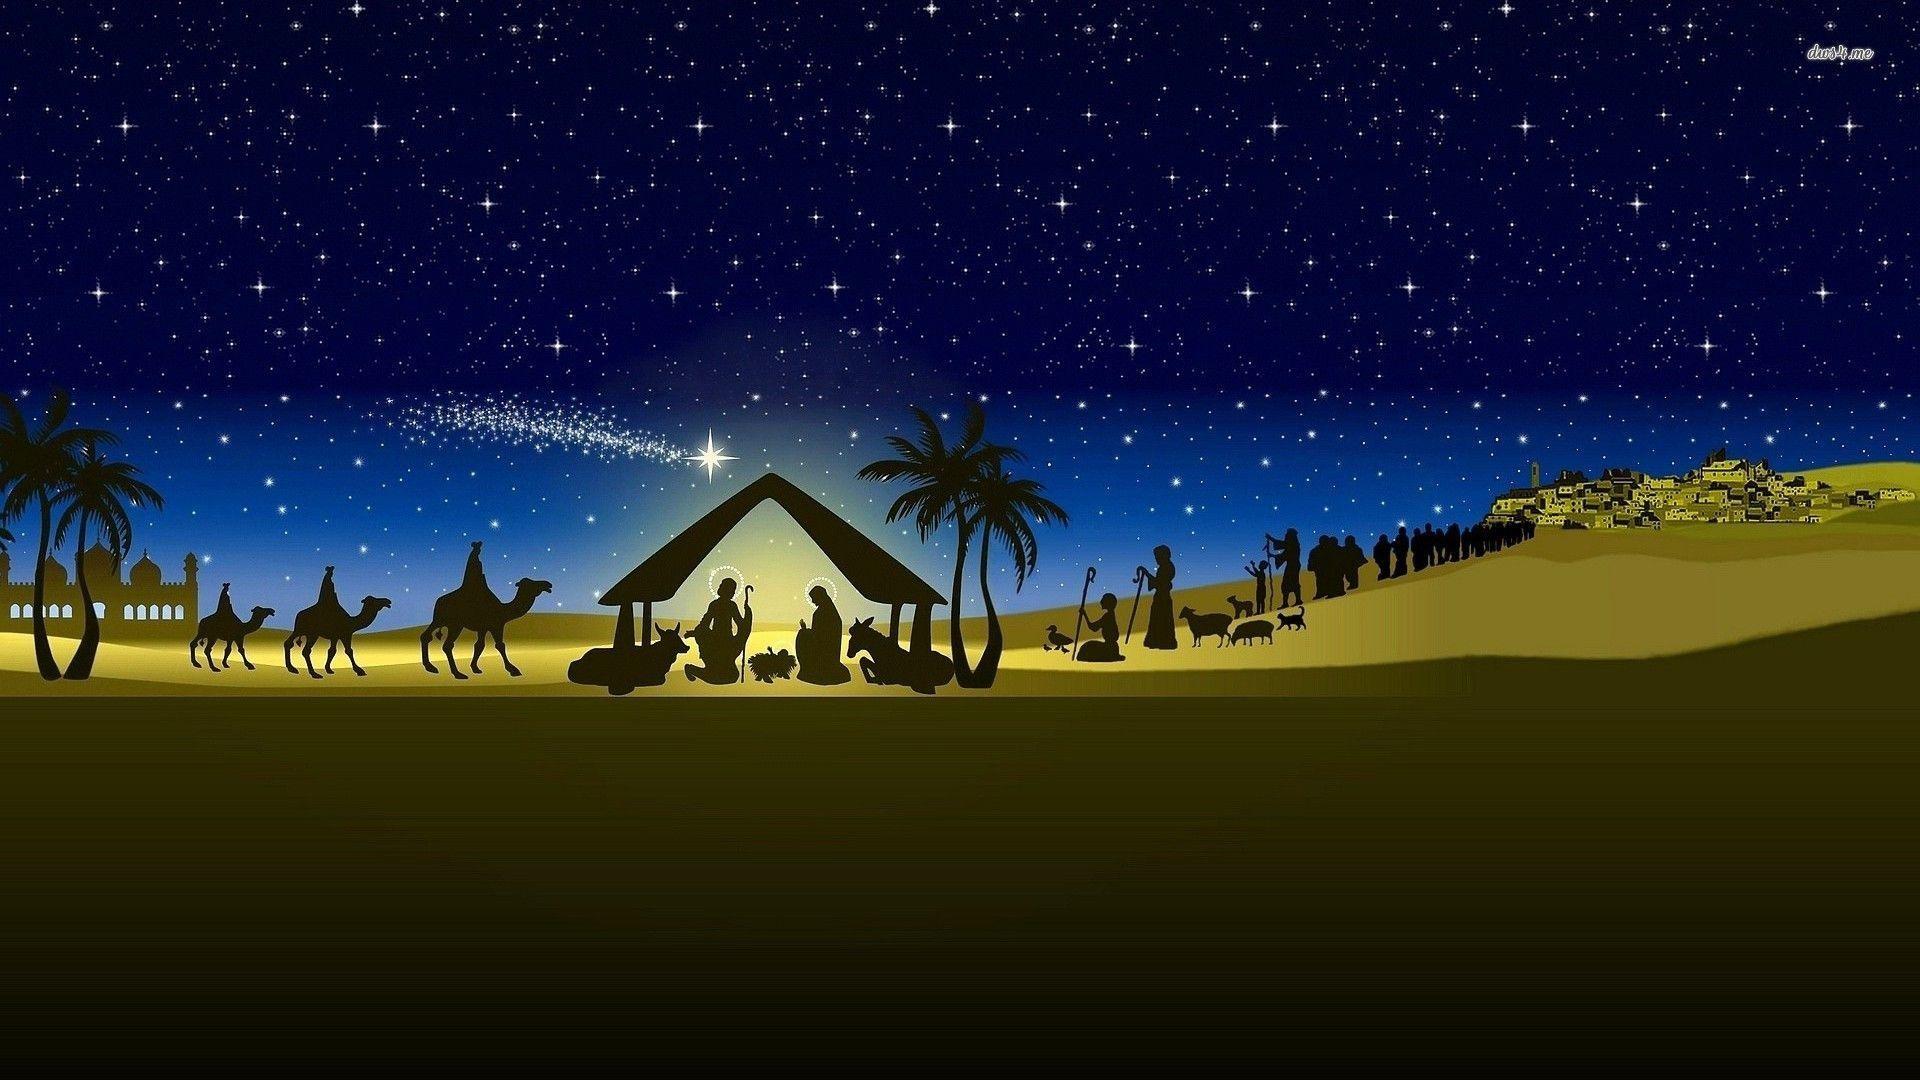 Nativity Scene Wallpaper | WallpaperToon